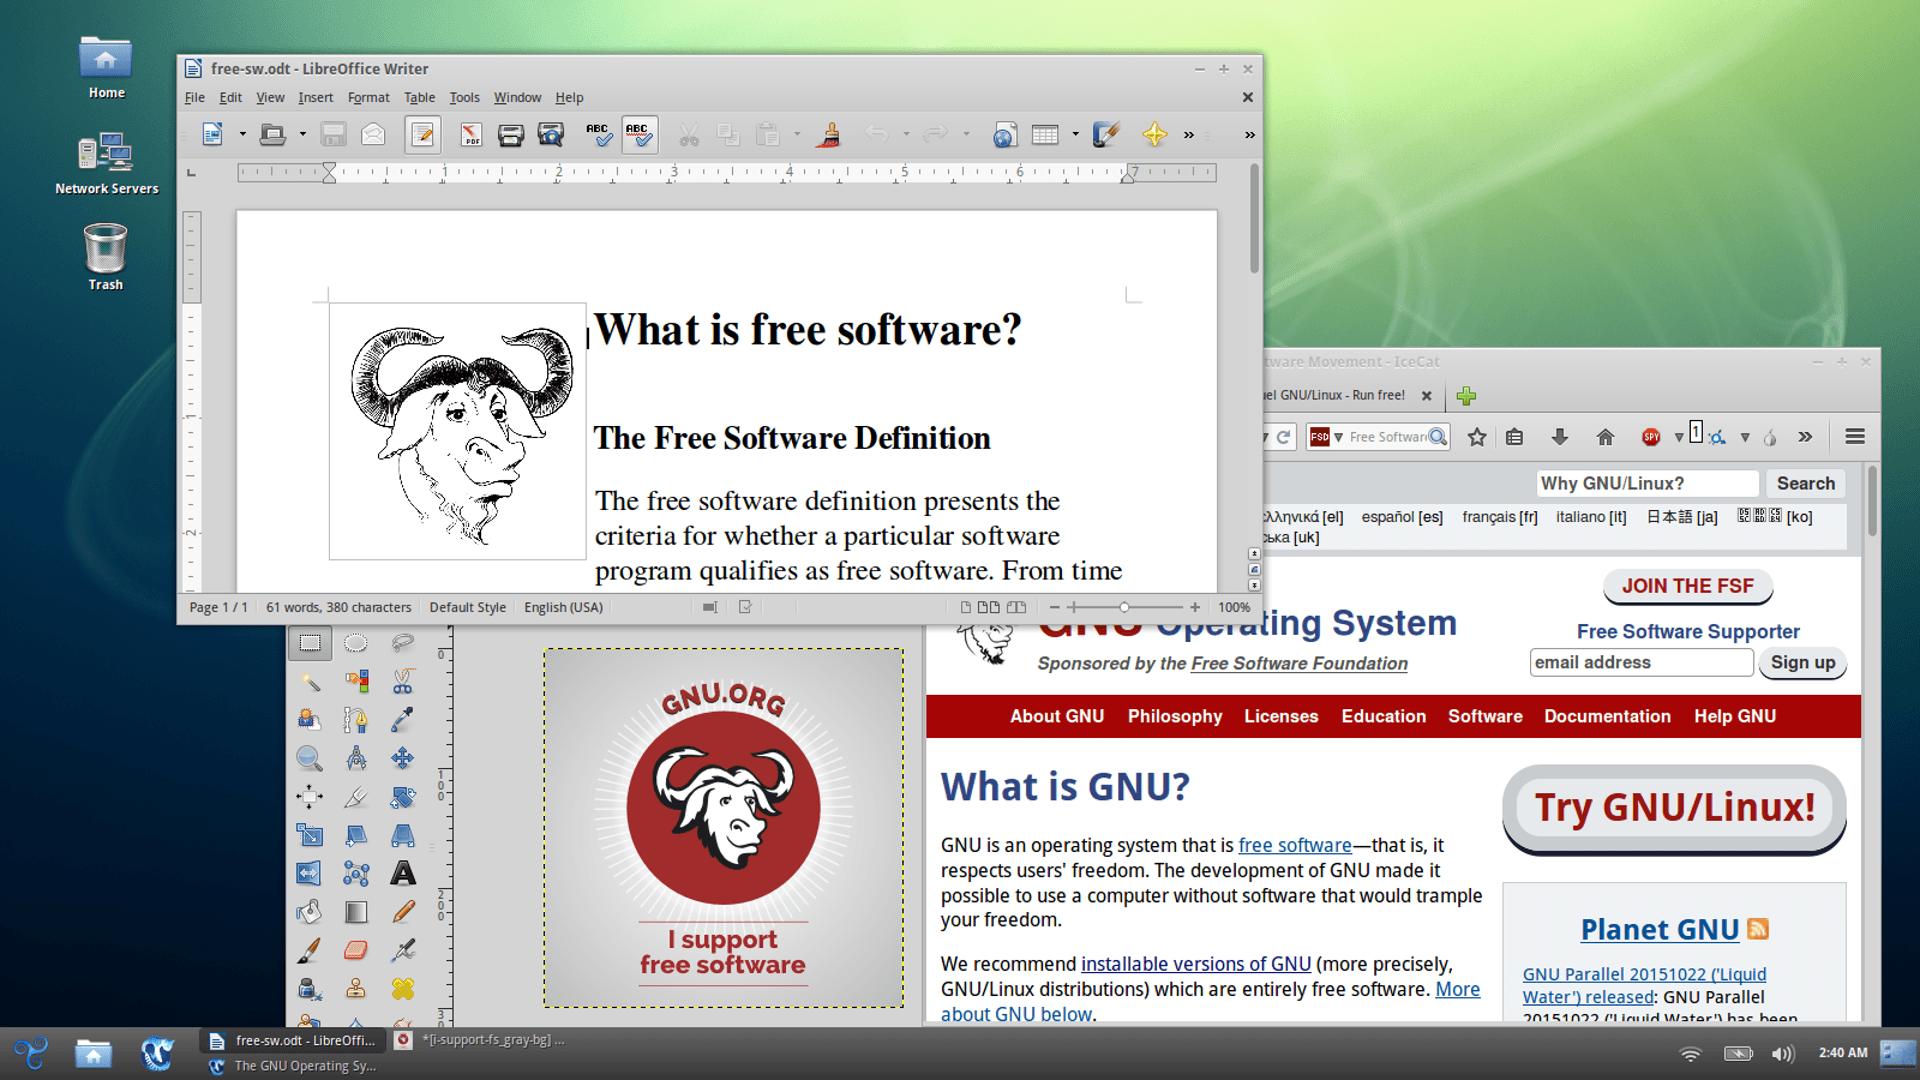 Linux Distribution Components